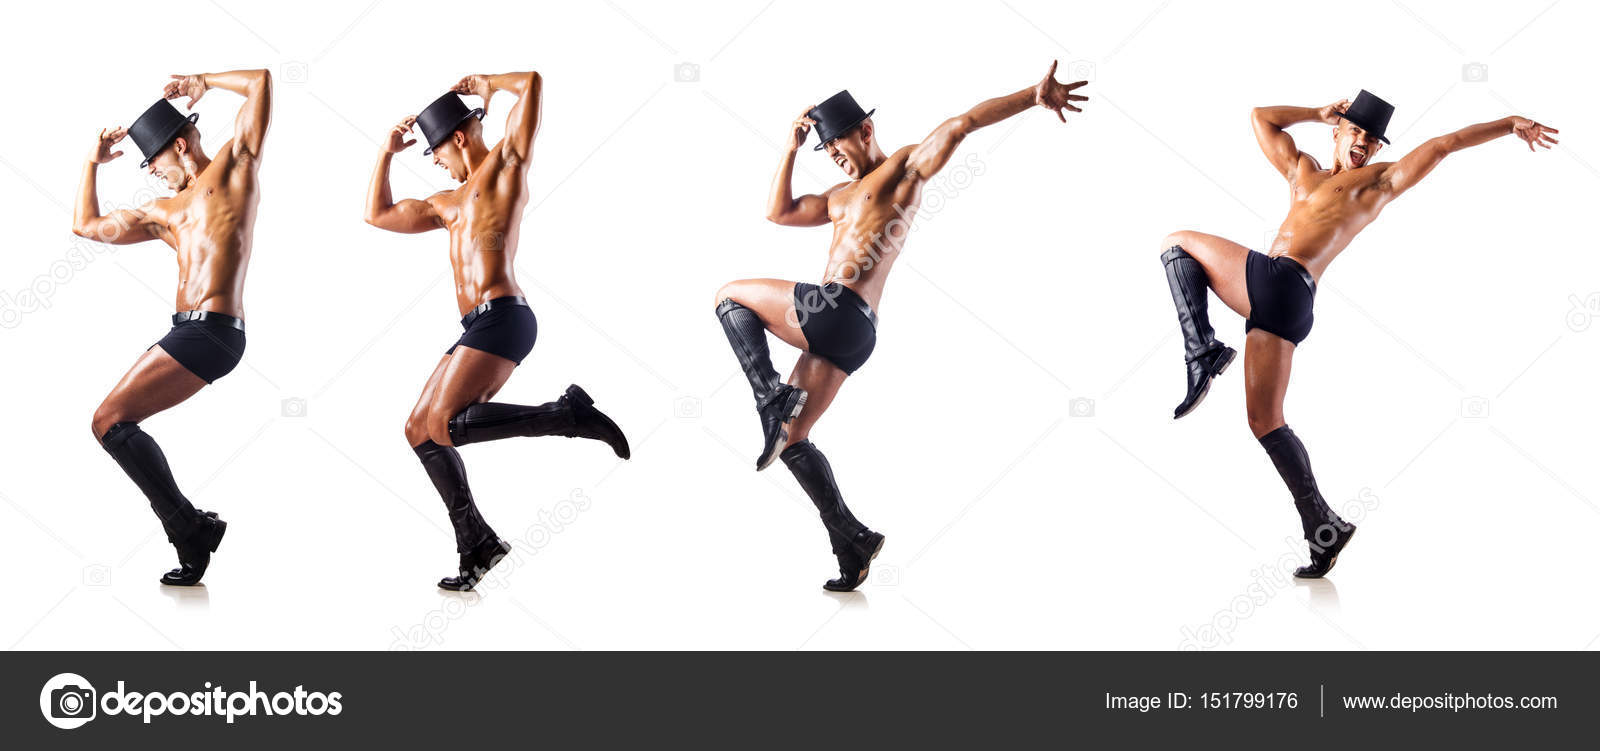 For nude street dancing congratulate